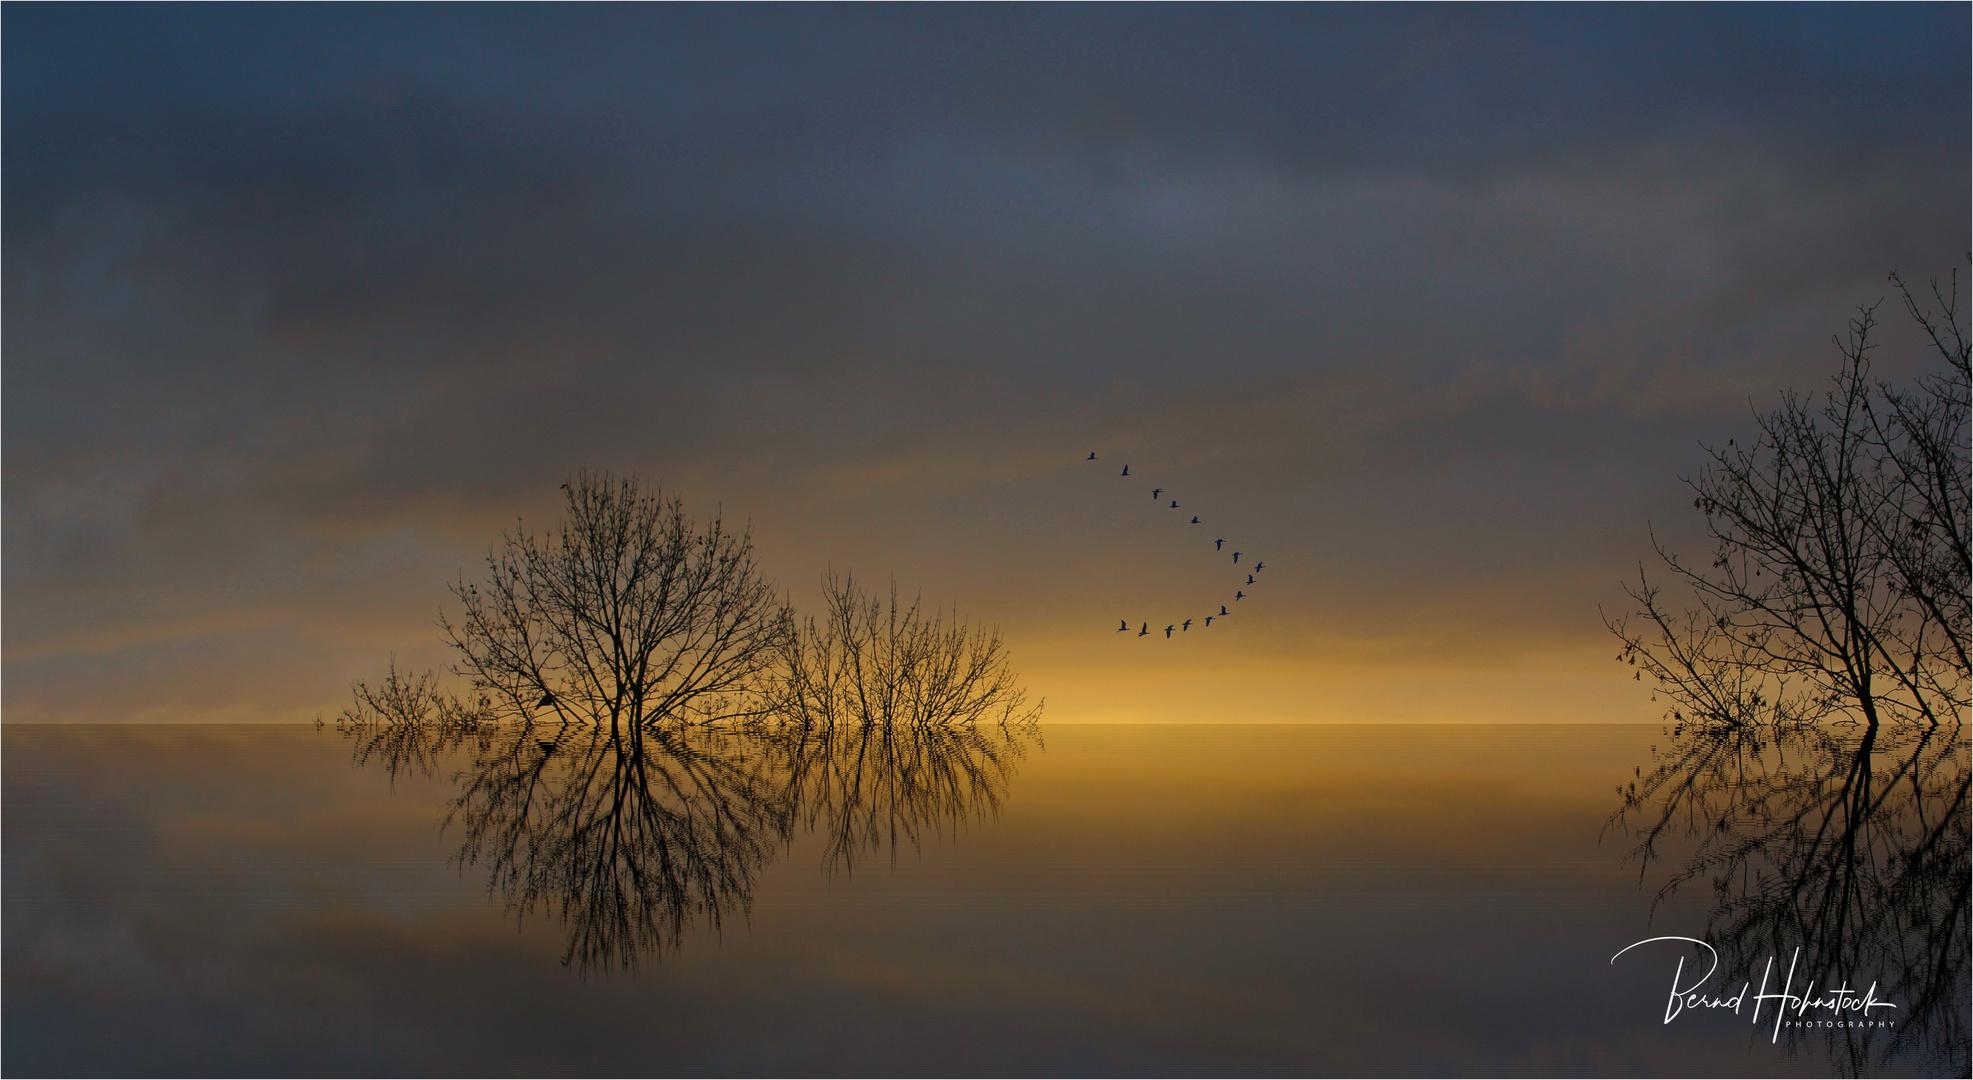 Zugvögel .... zum Sonnenaufgang